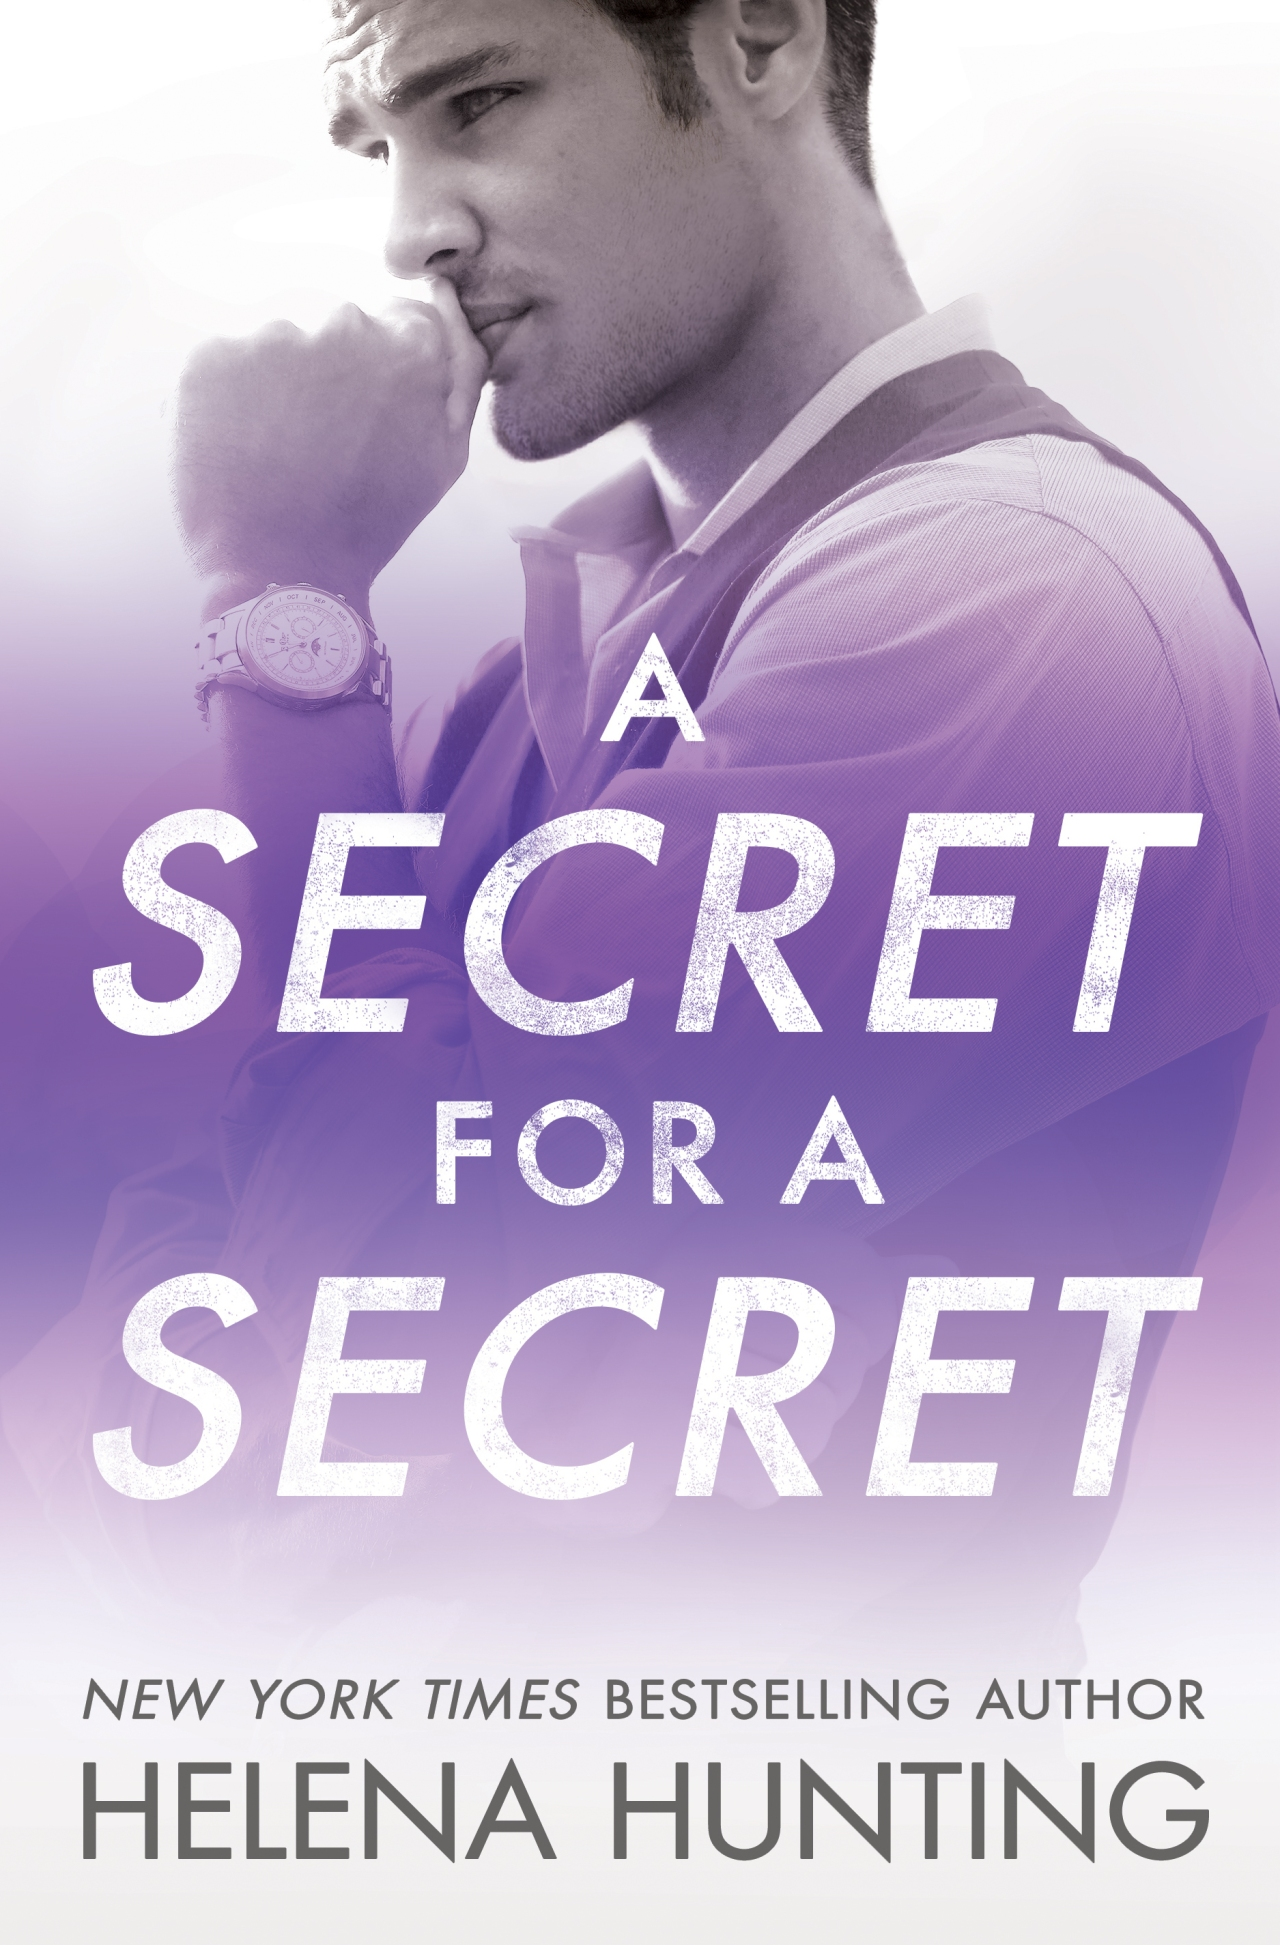 Hunting-A Secret for a Secret-28672-PB-FT